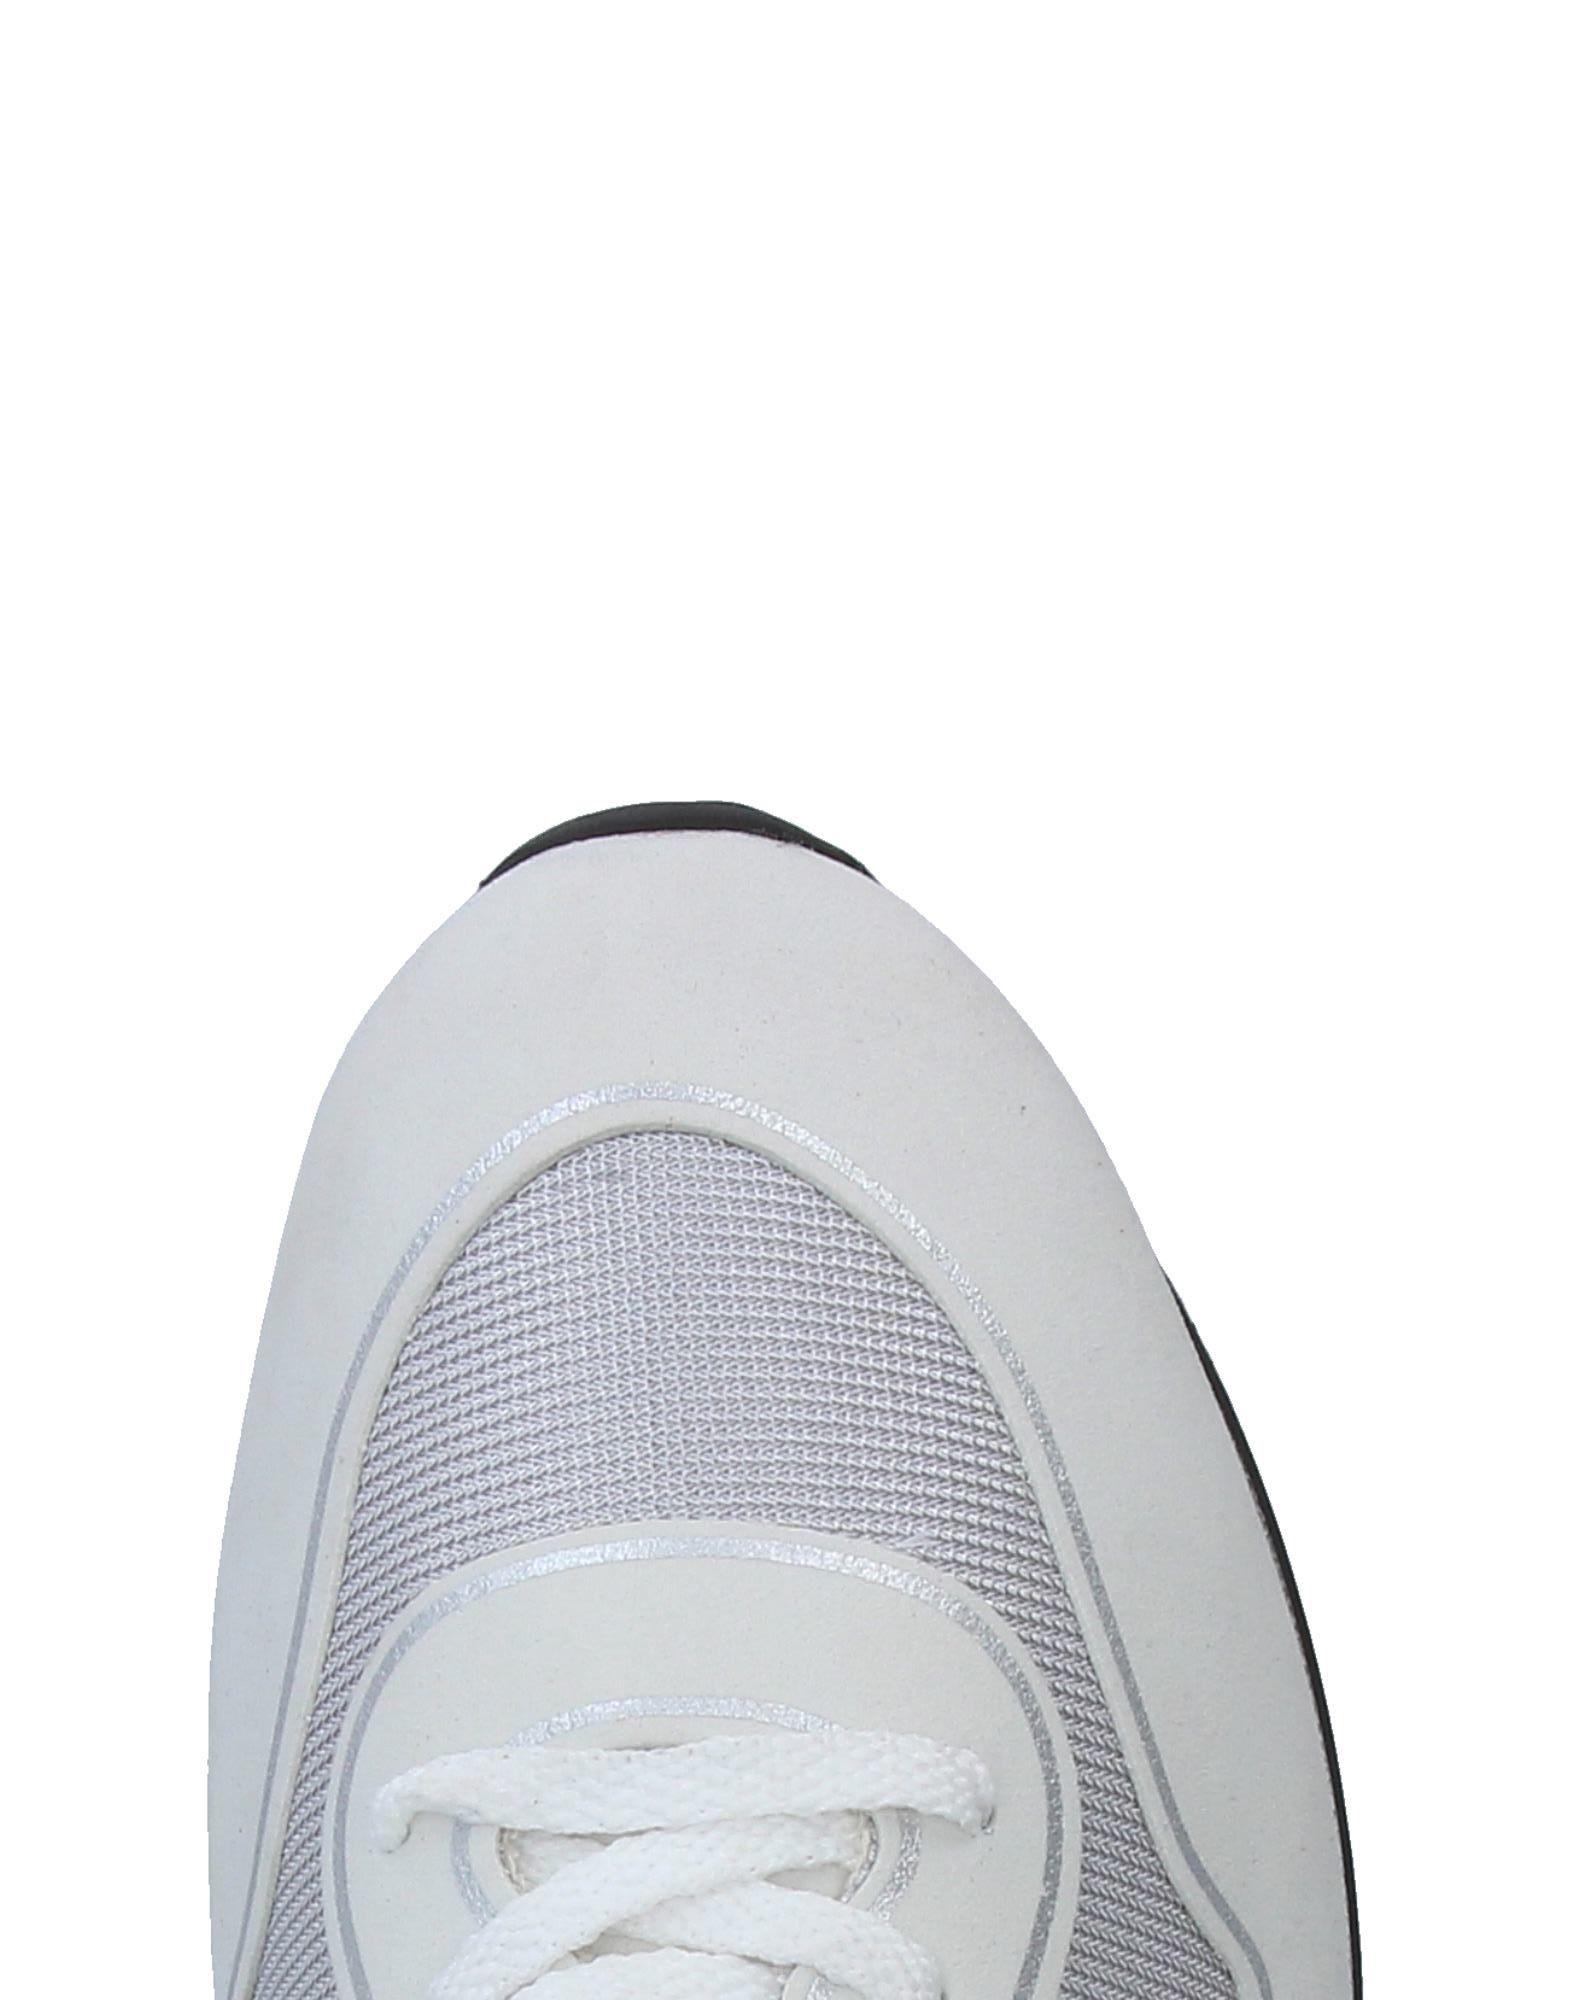 Golden Brand Goose Deluxe Brand Golden Sneakers Herren Gutes Preis-Leistungs-Verhältnis, es lohnt sich 1683b9